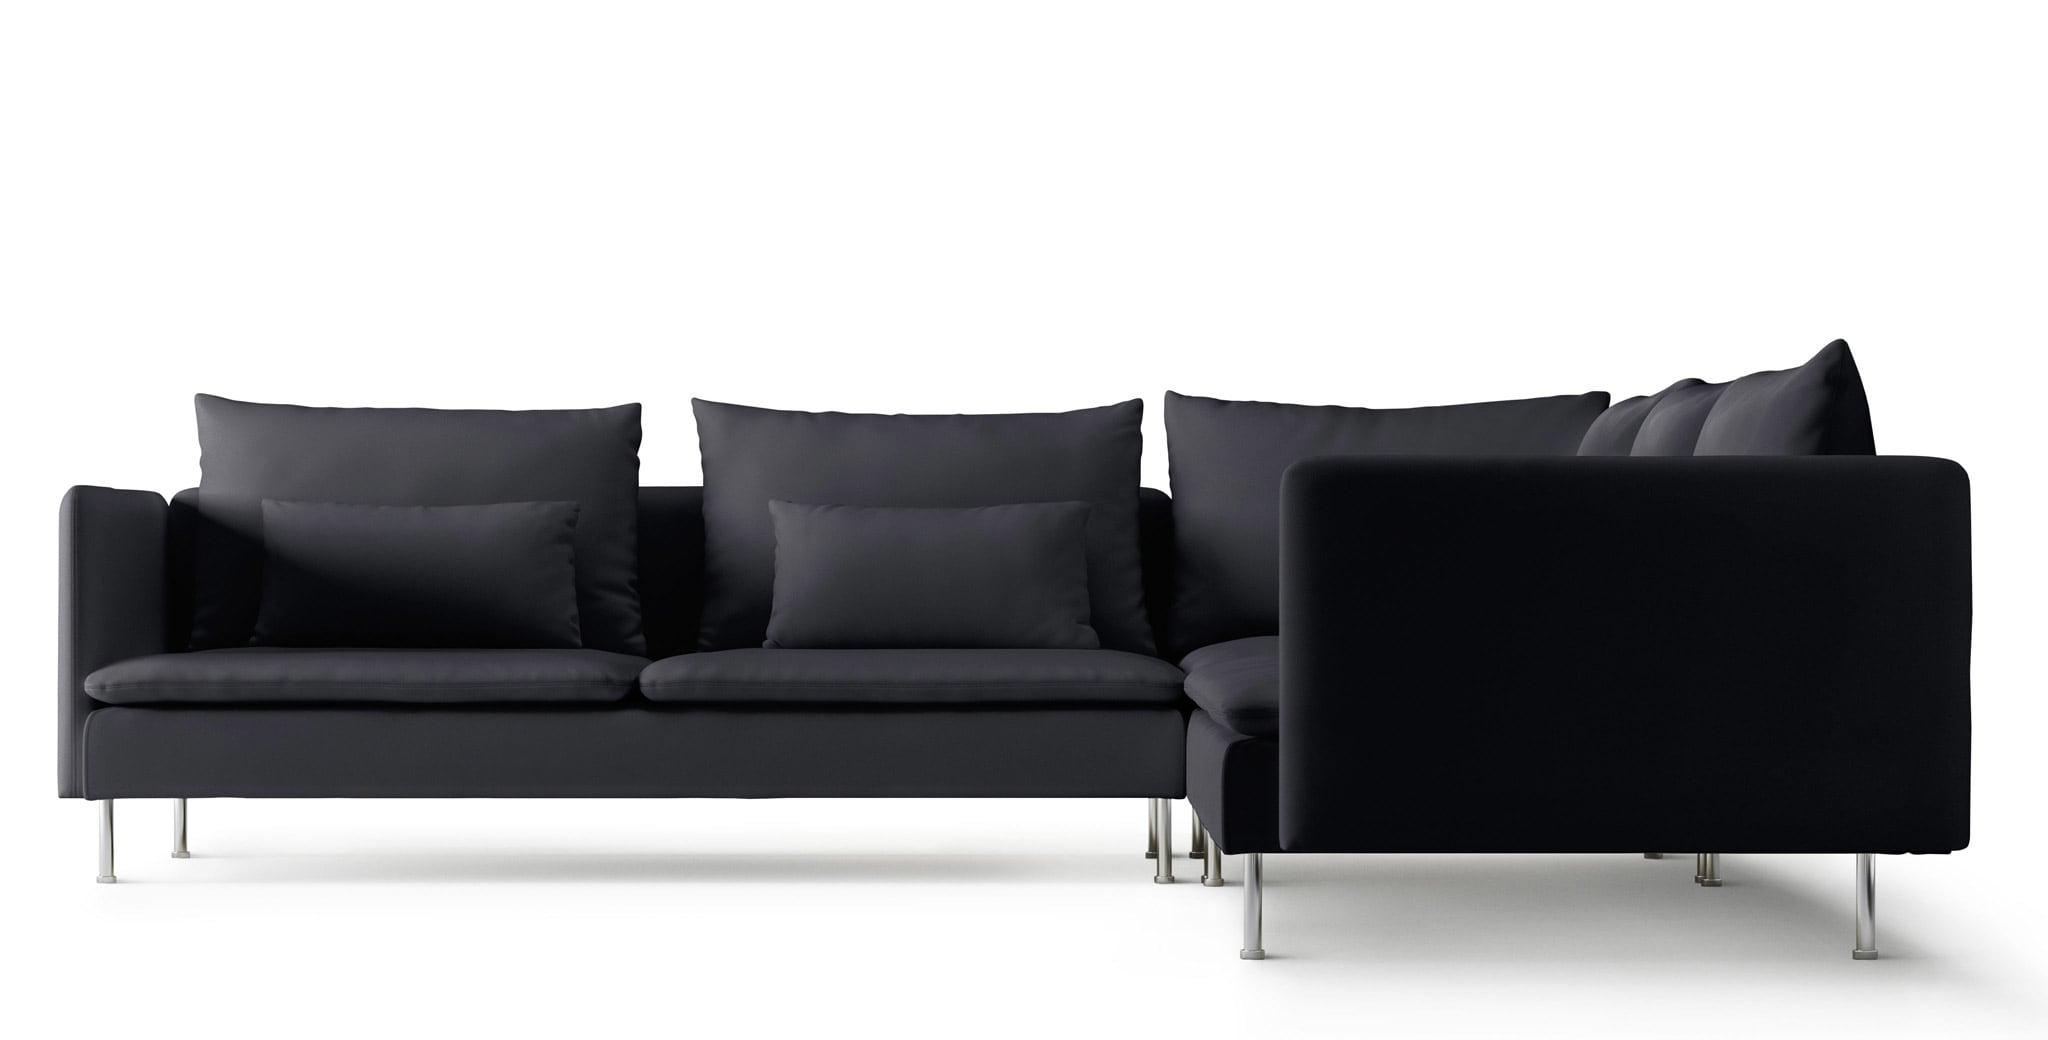 Ikea Fabric Corner Sofas | Ireland – Dublin Inside Lucy Dark Grey Sofa Chairs (View 3 of 25)